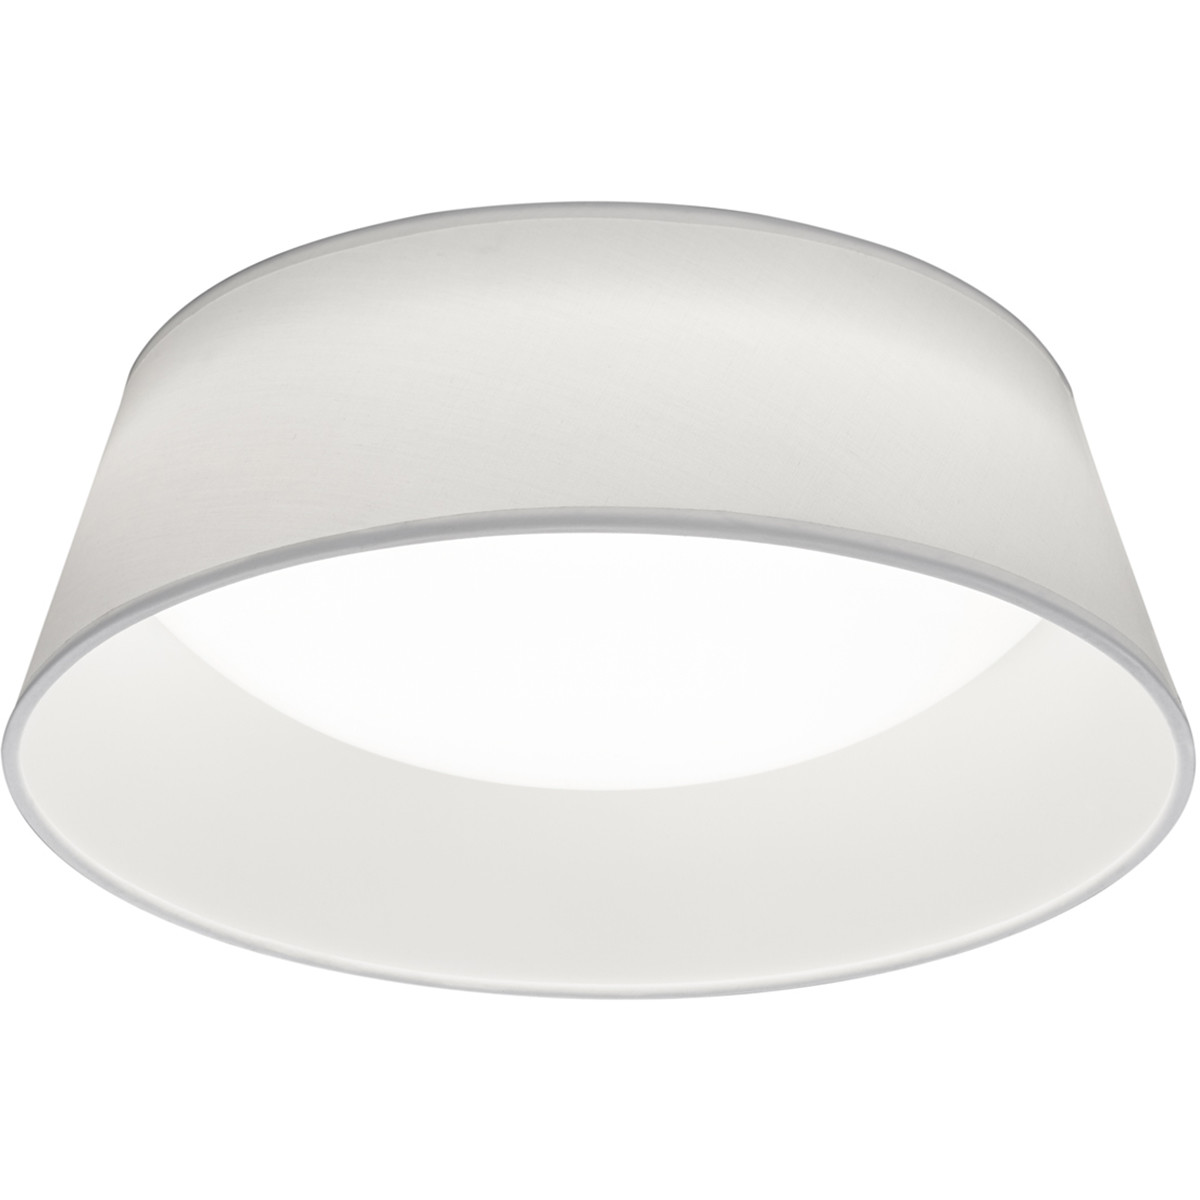 LED Plafondlamp - Plafondverlichting - Trion Pinton - 14W - Warm Wit 3000K - Rond - Mat Wit - Textie